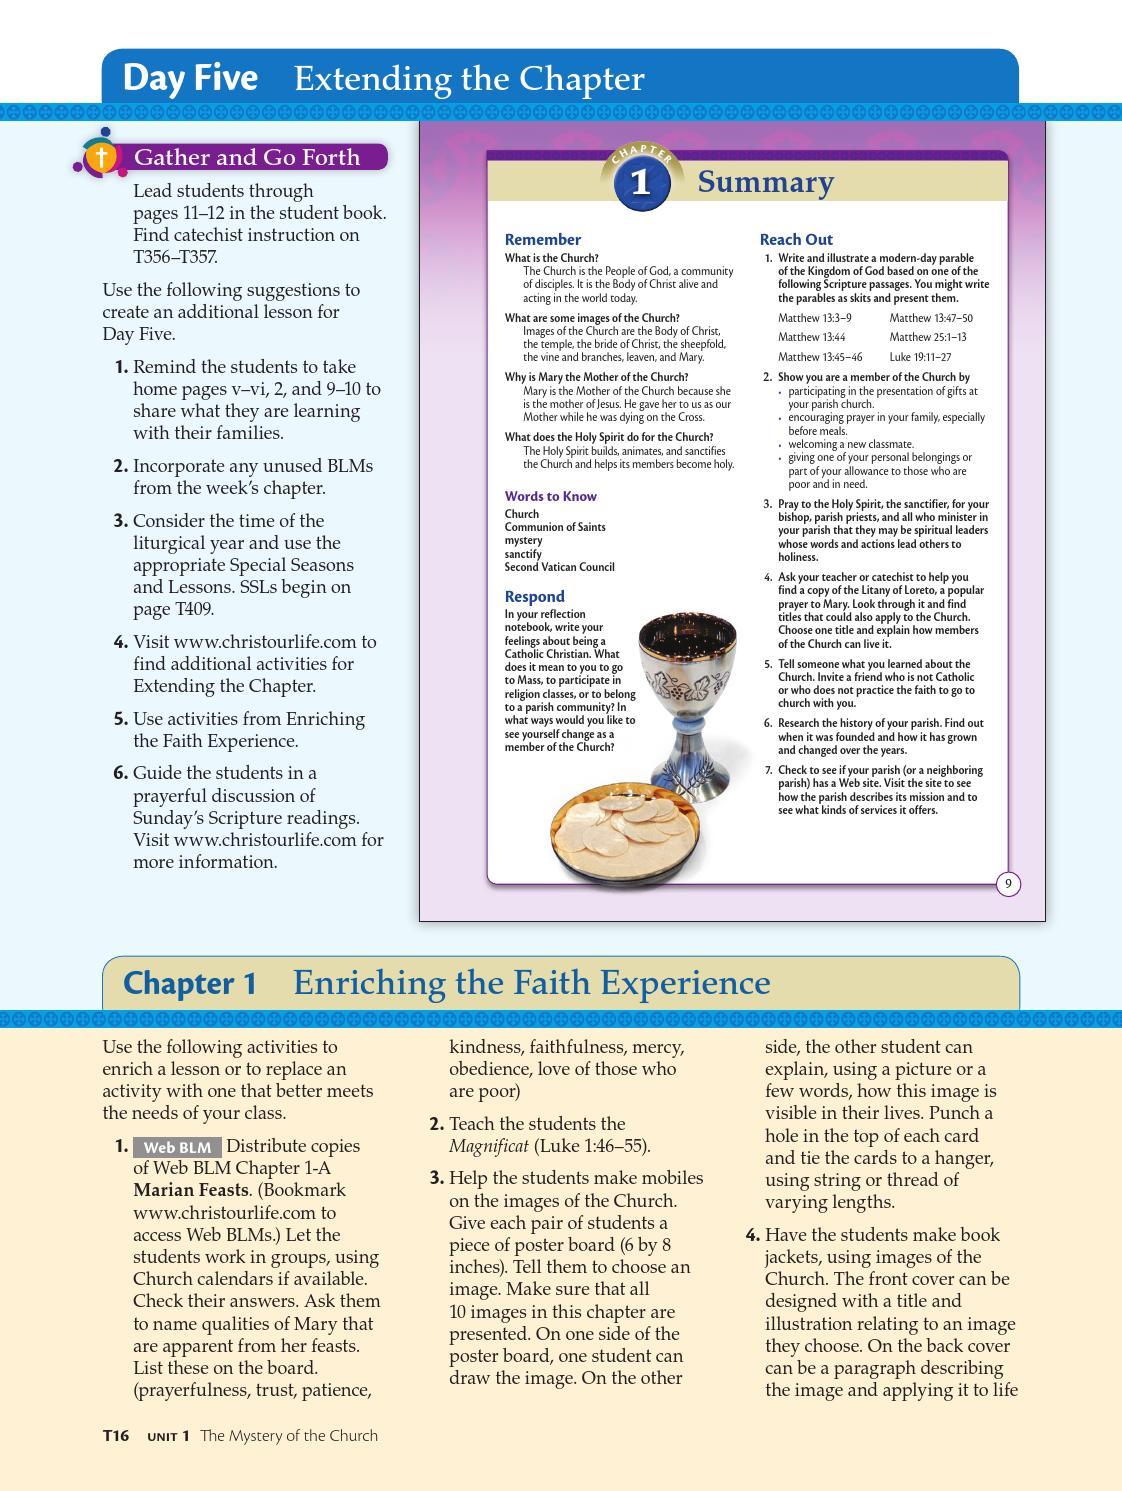 hight resolution of Christ Our Life 2016 Grade 8 Teacher School Edition by Loyola Press - issuu